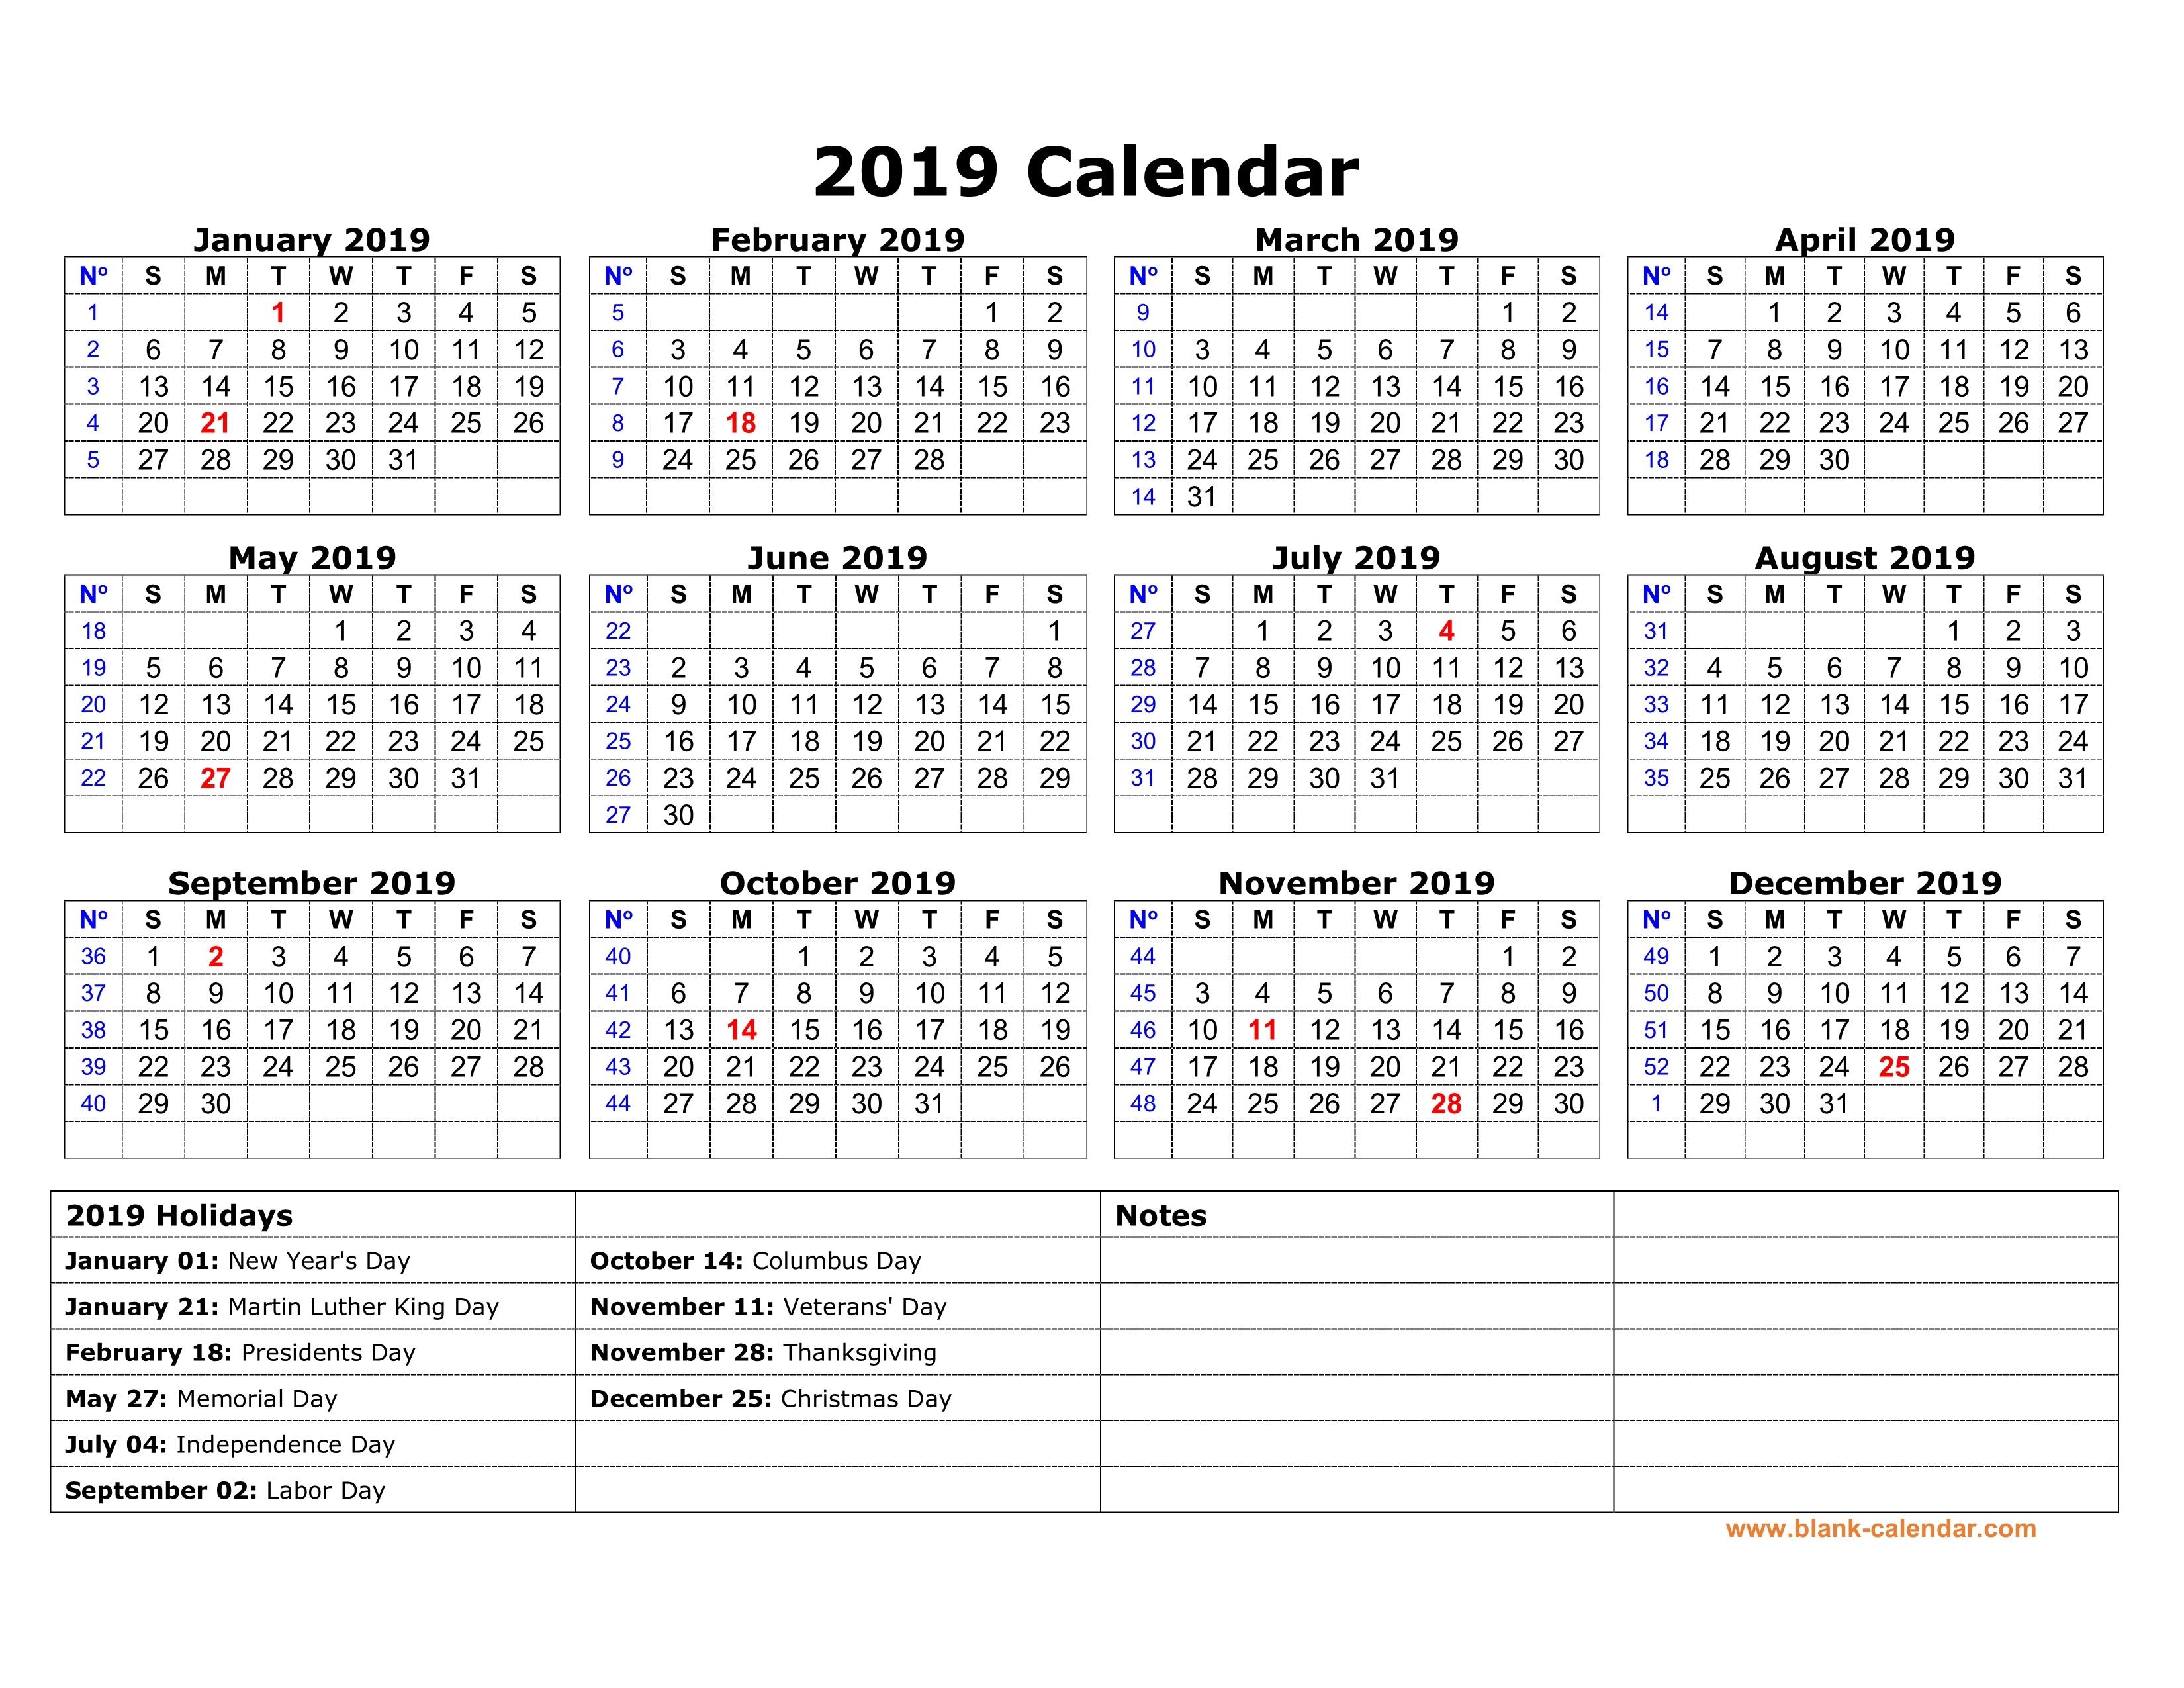 2019 Calendar Holidays Printable